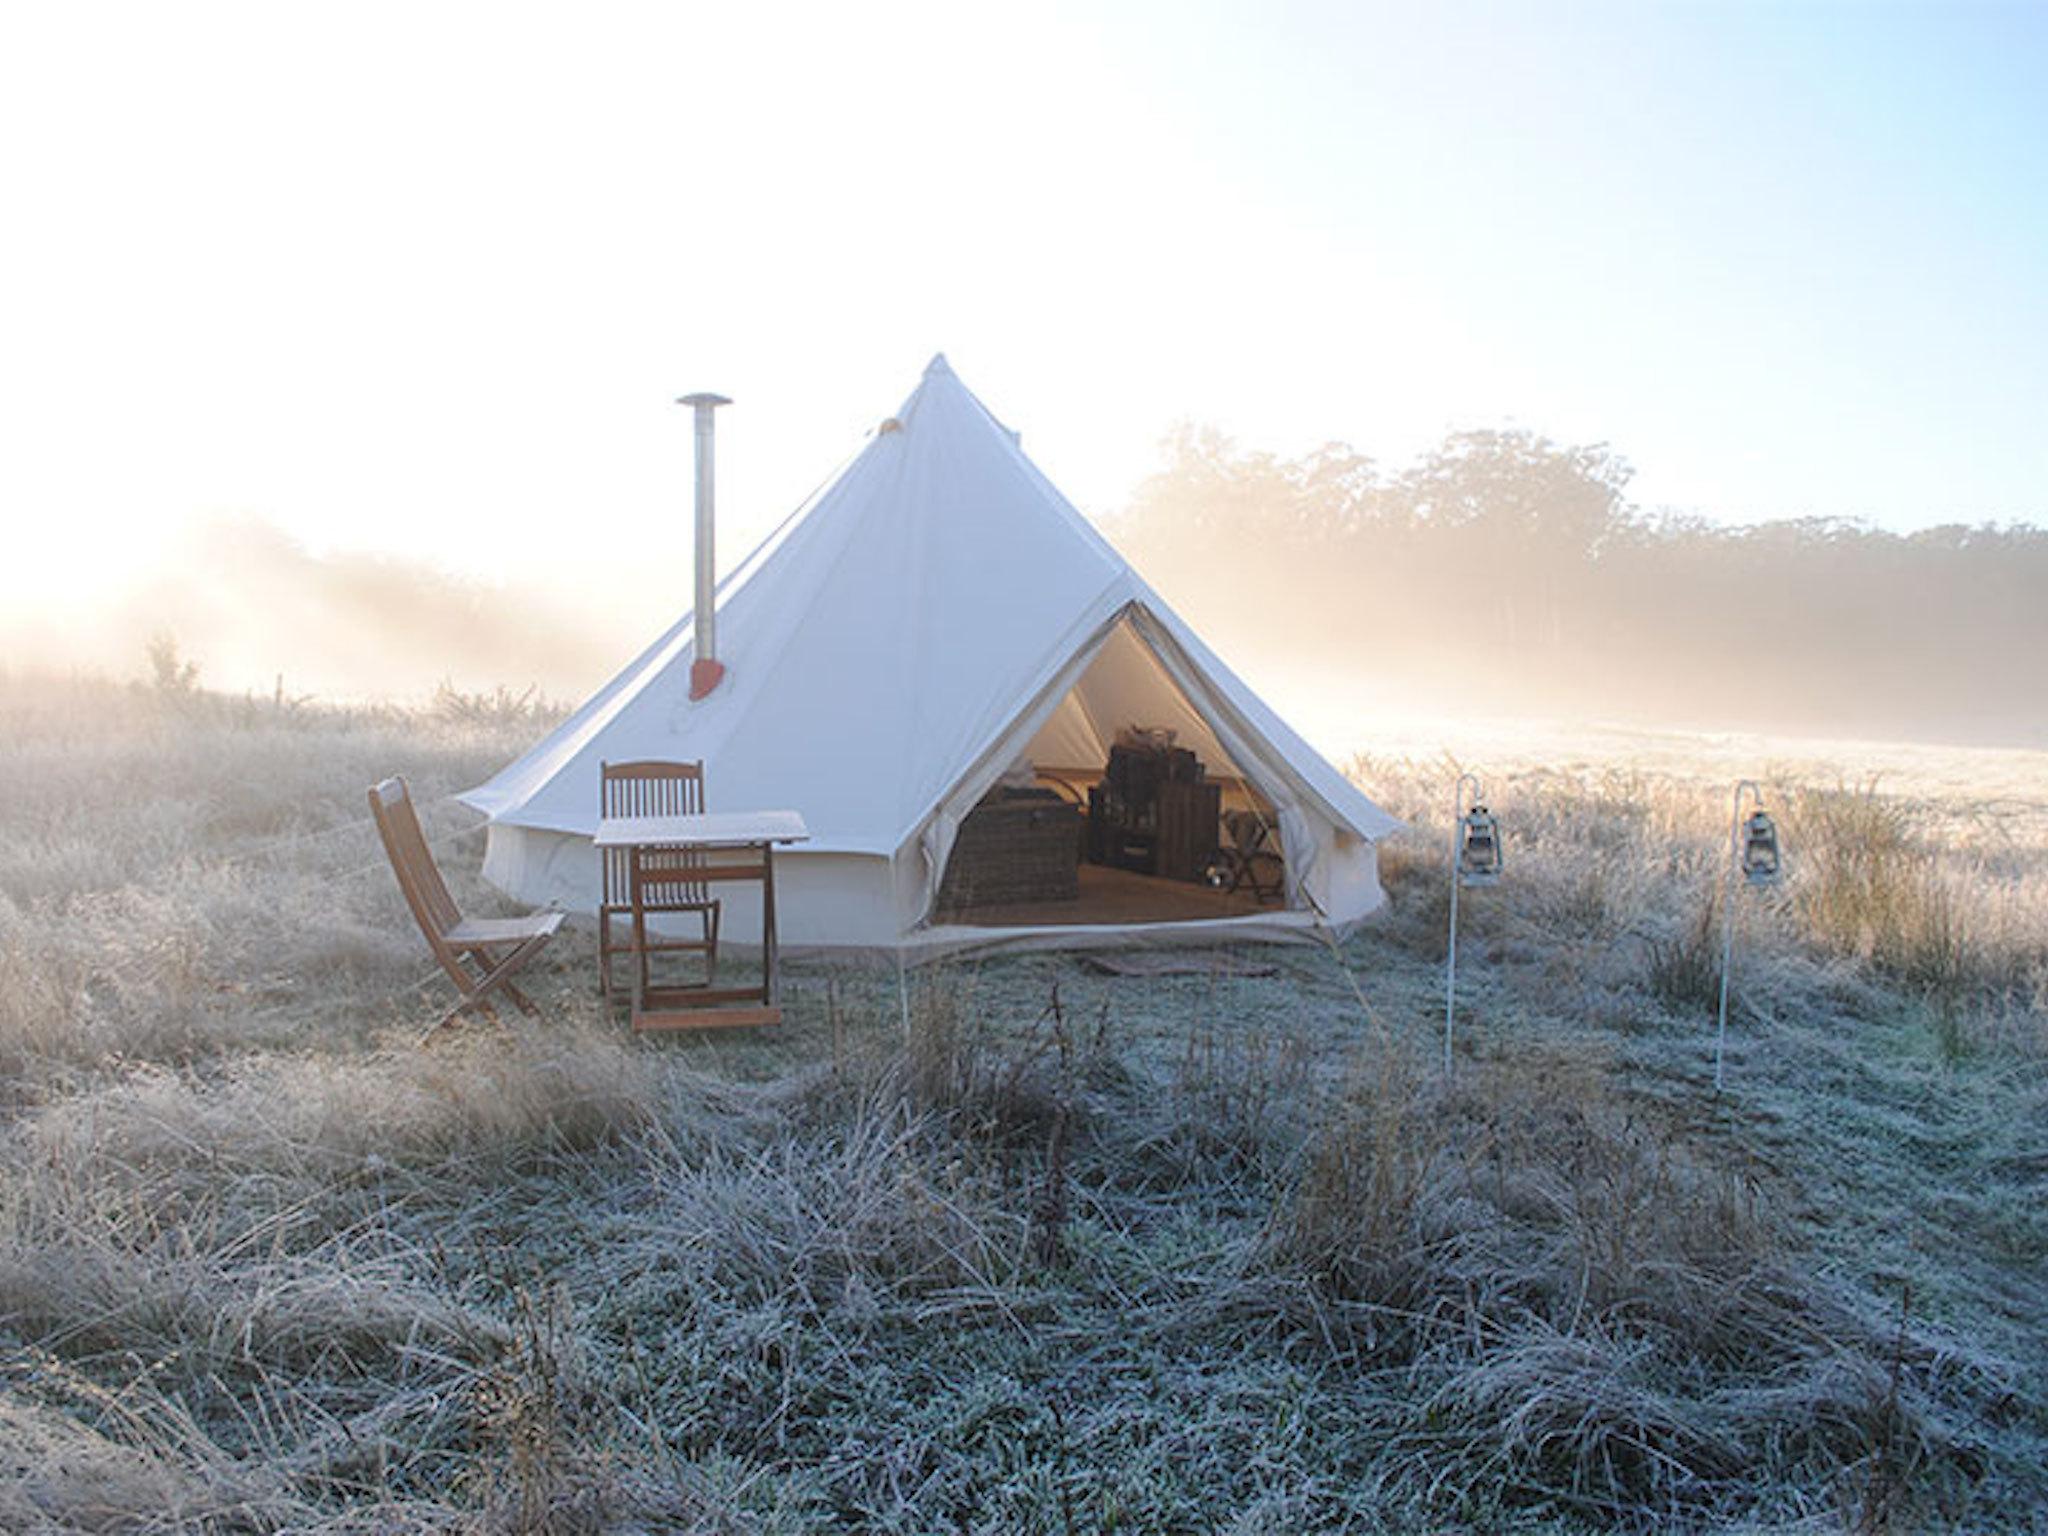 Tent in a plain